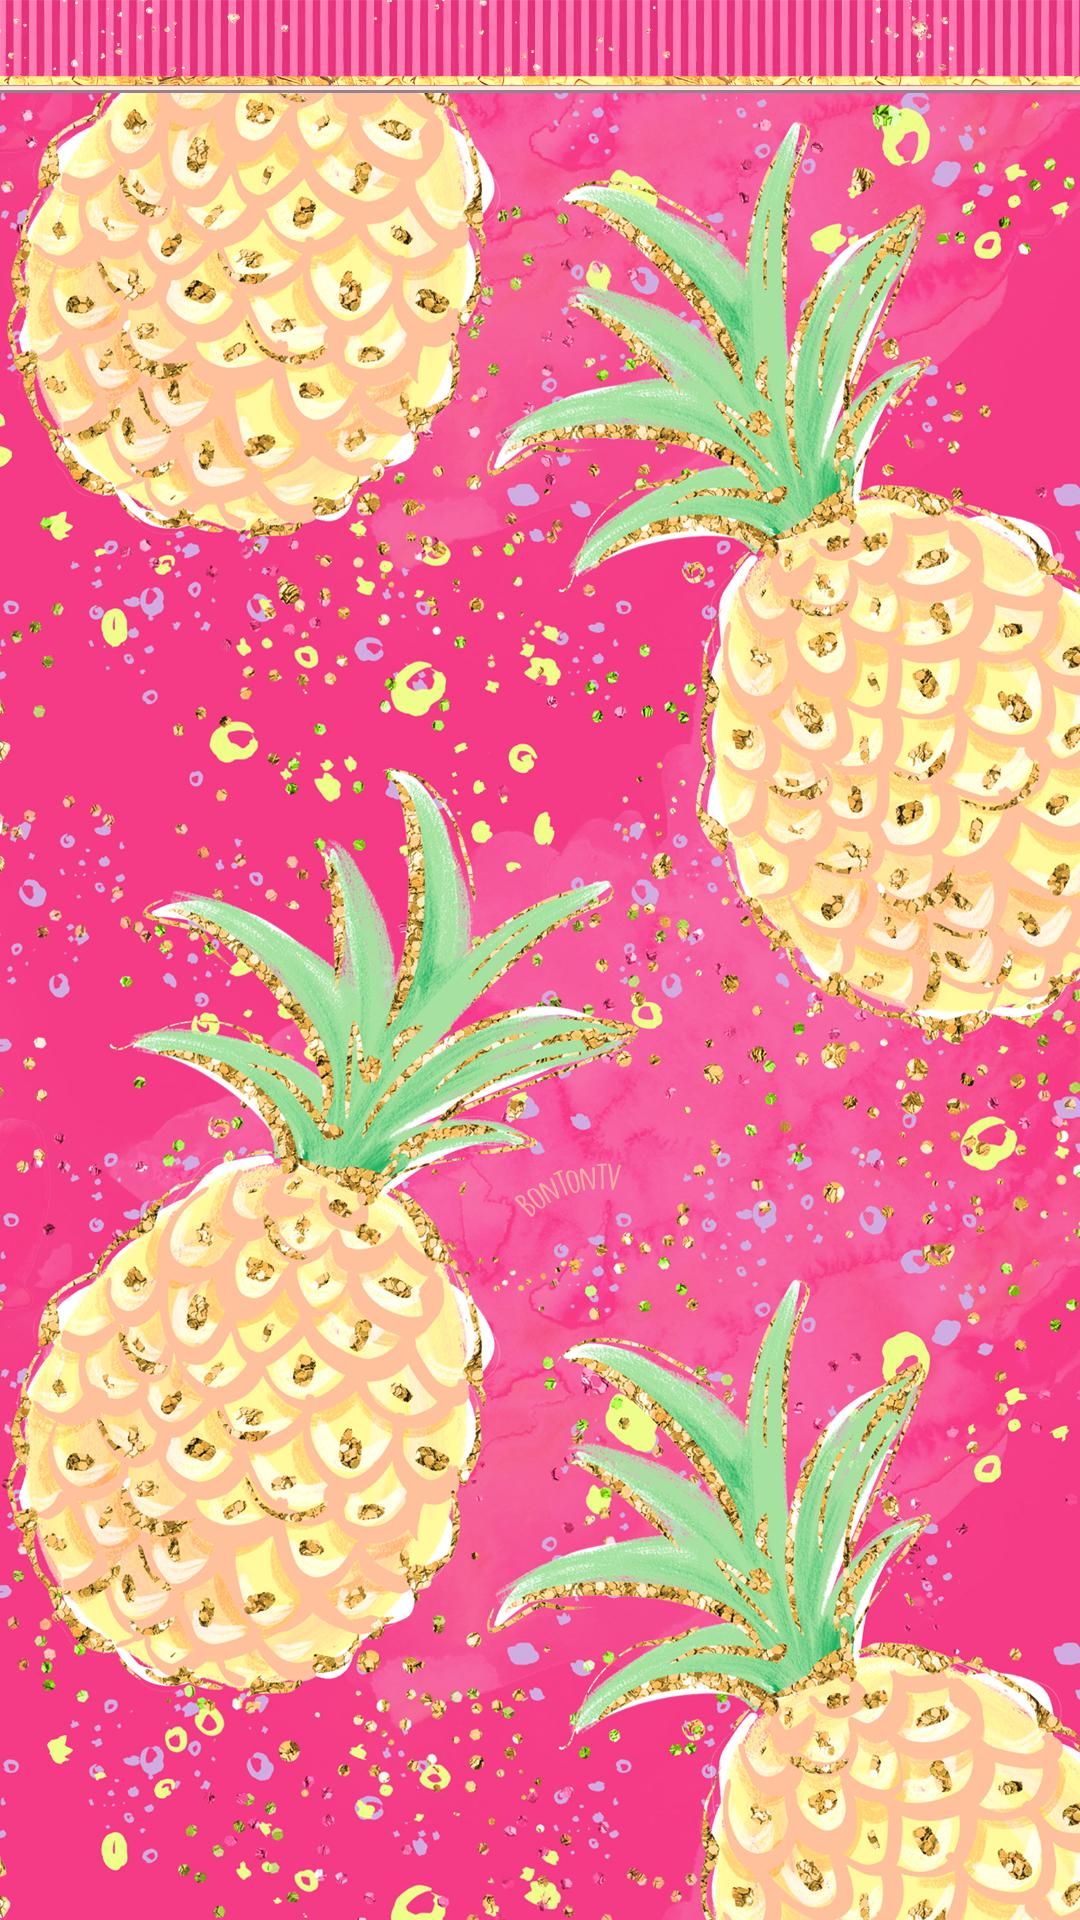 Phone Wallpapers Hd By Bonton Tv Free Download 1080x1920 Iphone Wallpapers Androi Glitter Phone Wallpaper Cute Summer Wallpapers Pink Wallpaper Iphone